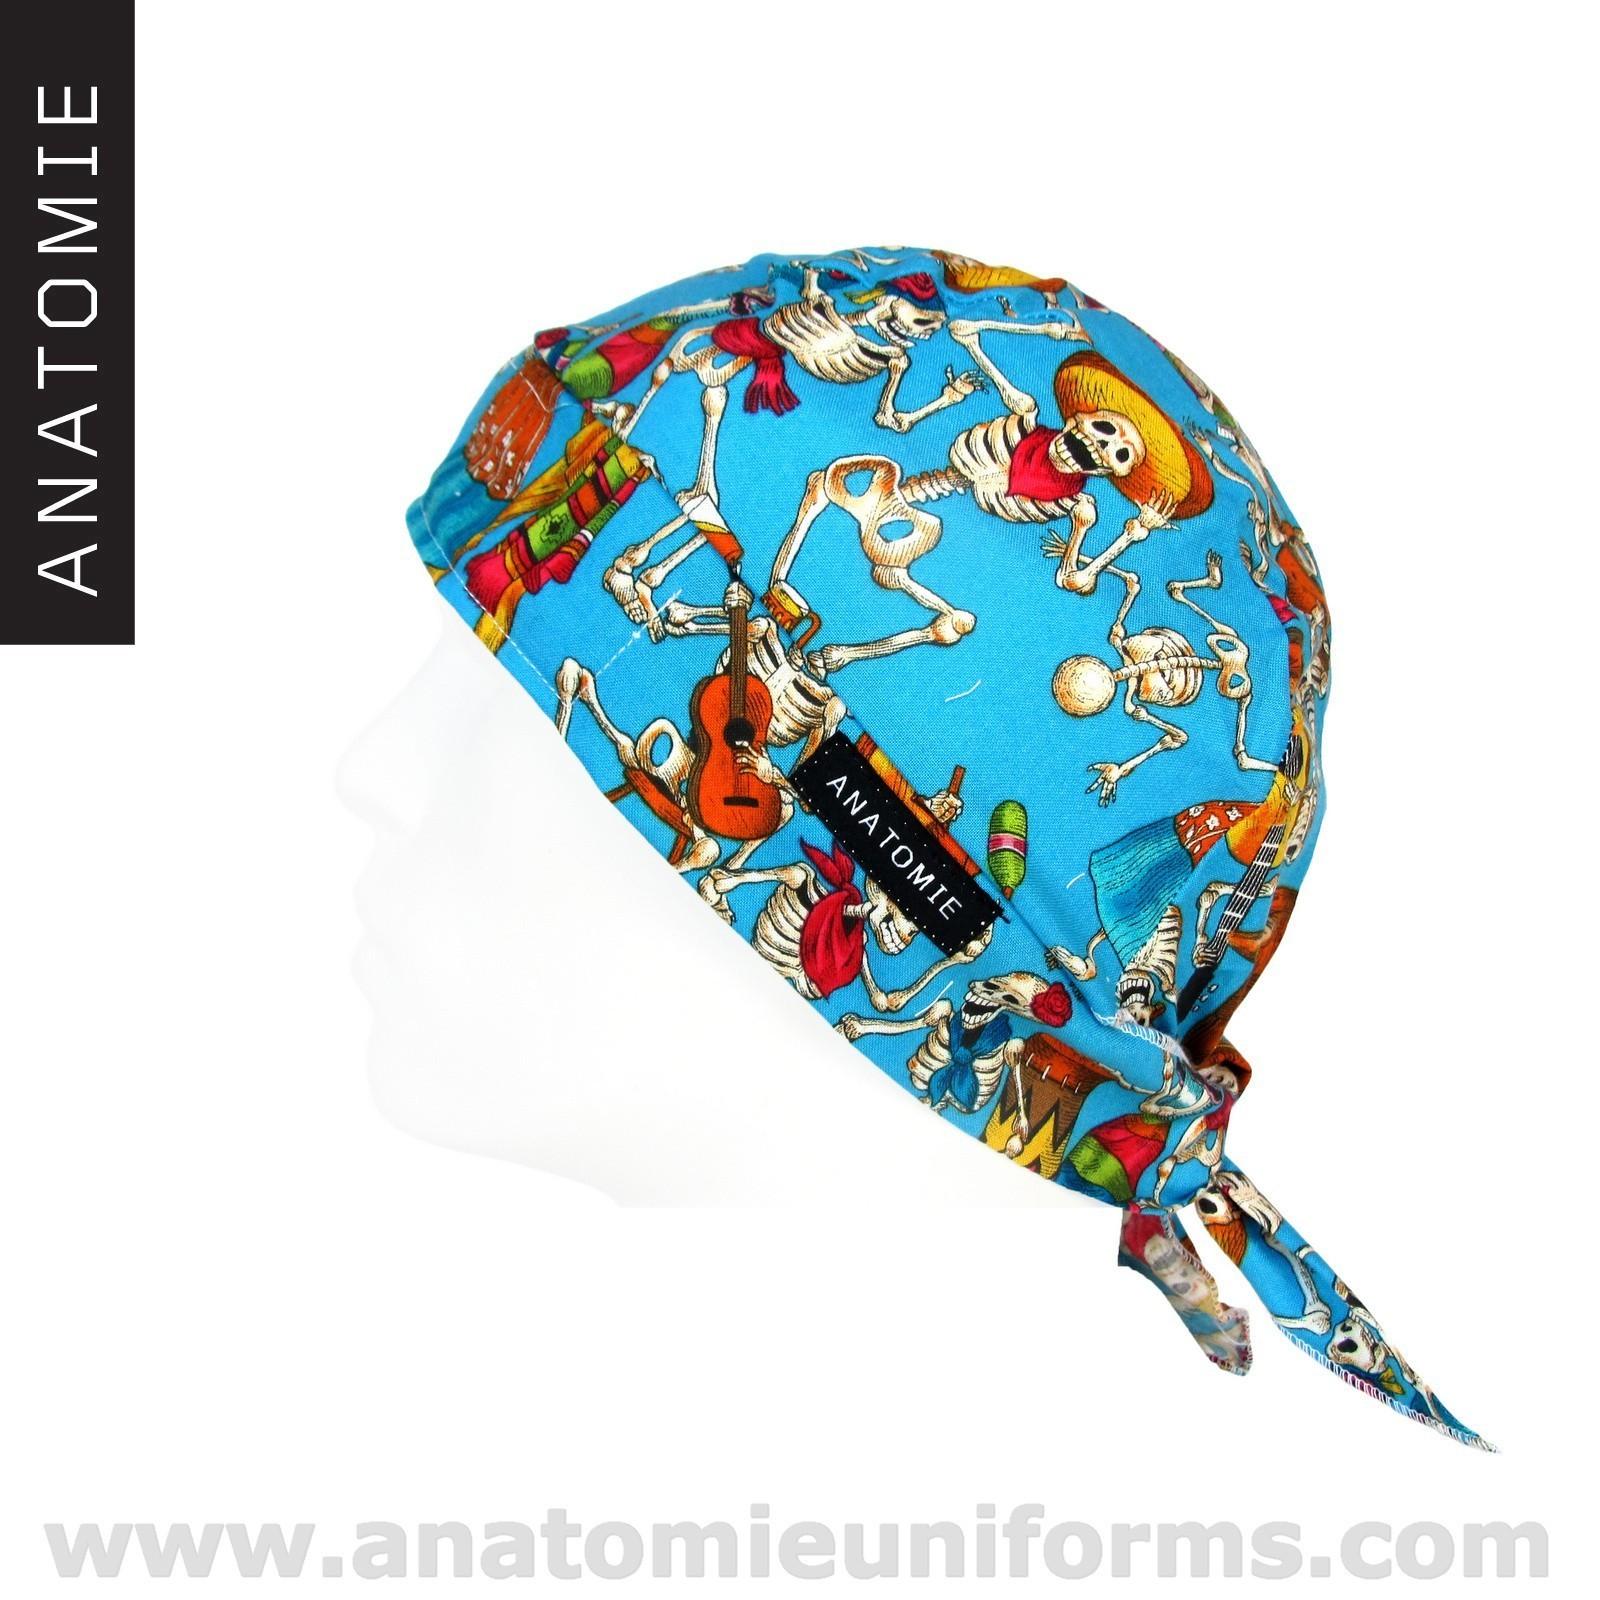 ANATOMIE BANDANA Chirurgie Jour Des Morts Bleu - 020